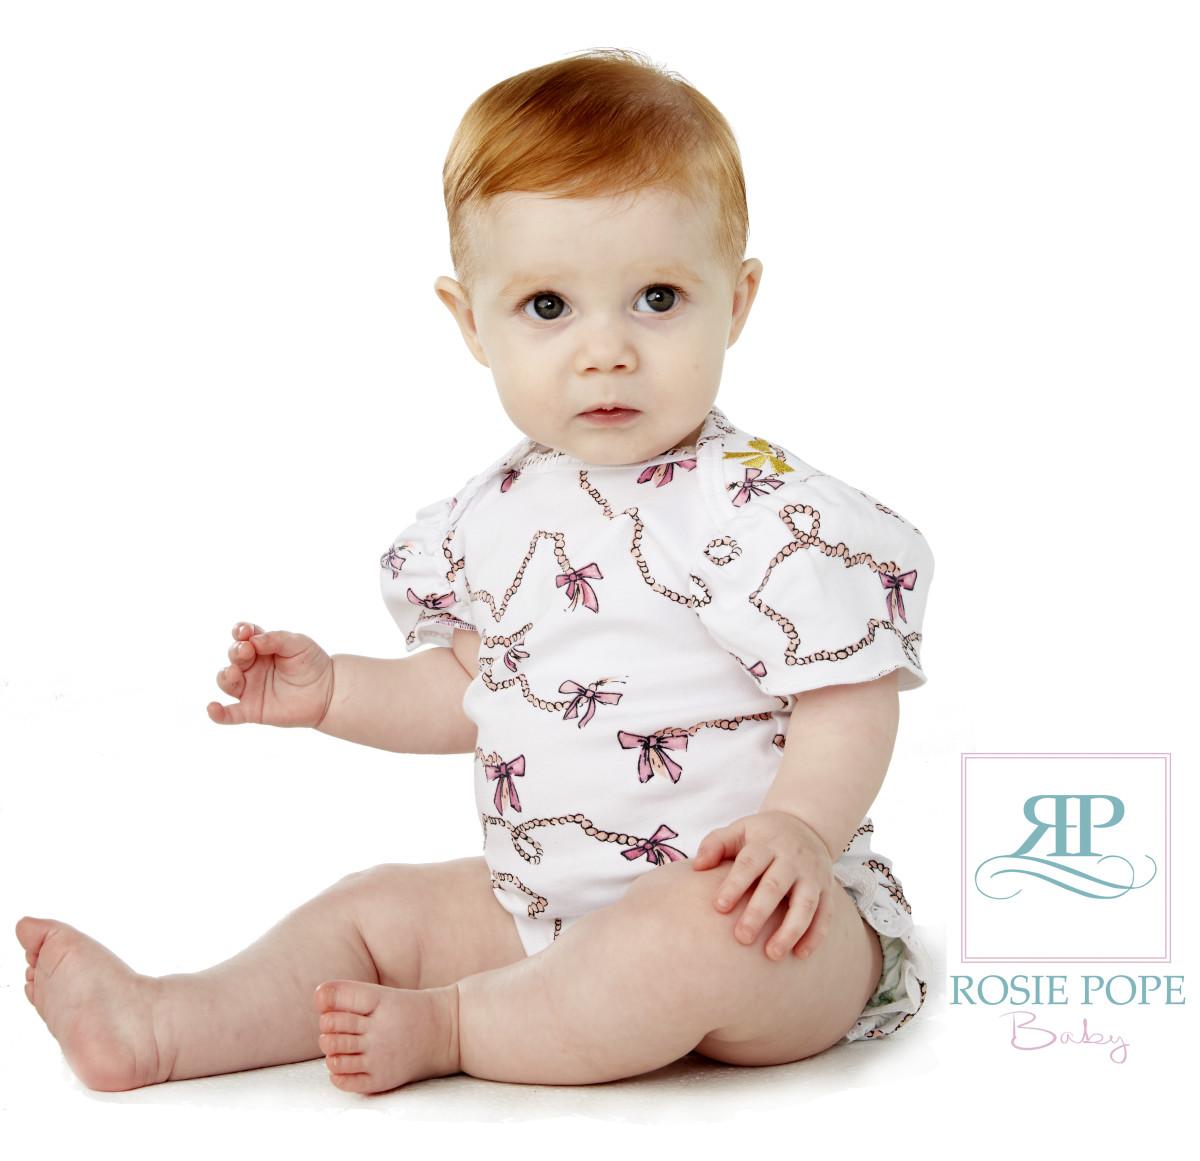 Fullsize Of Rosie Pope Baby